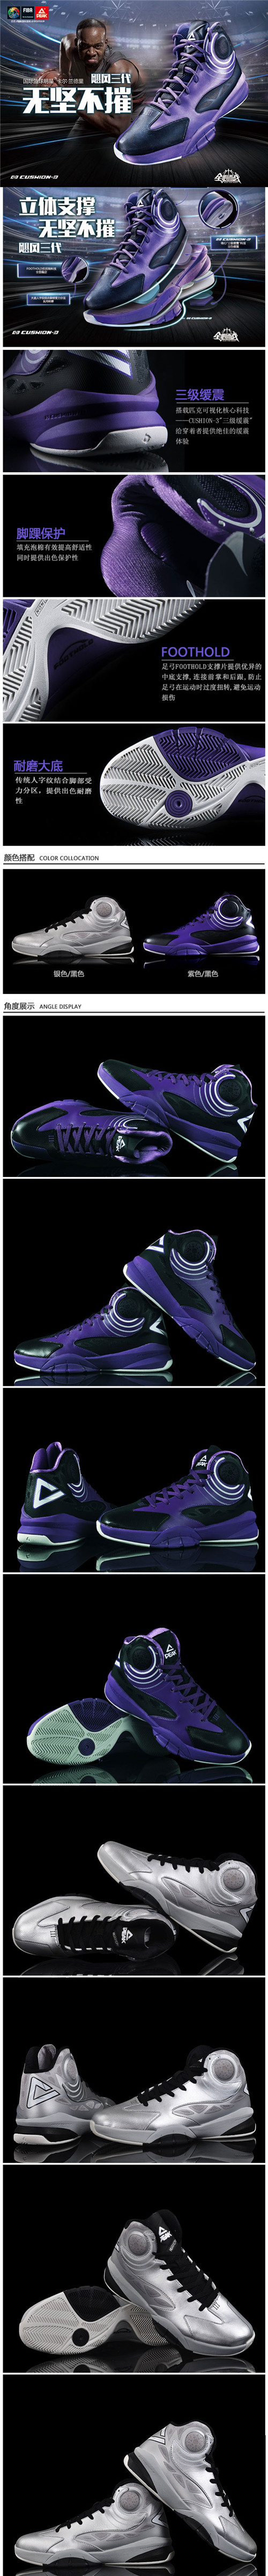 Peak Hurricane III Carl Landry Professional Basketball Shoes